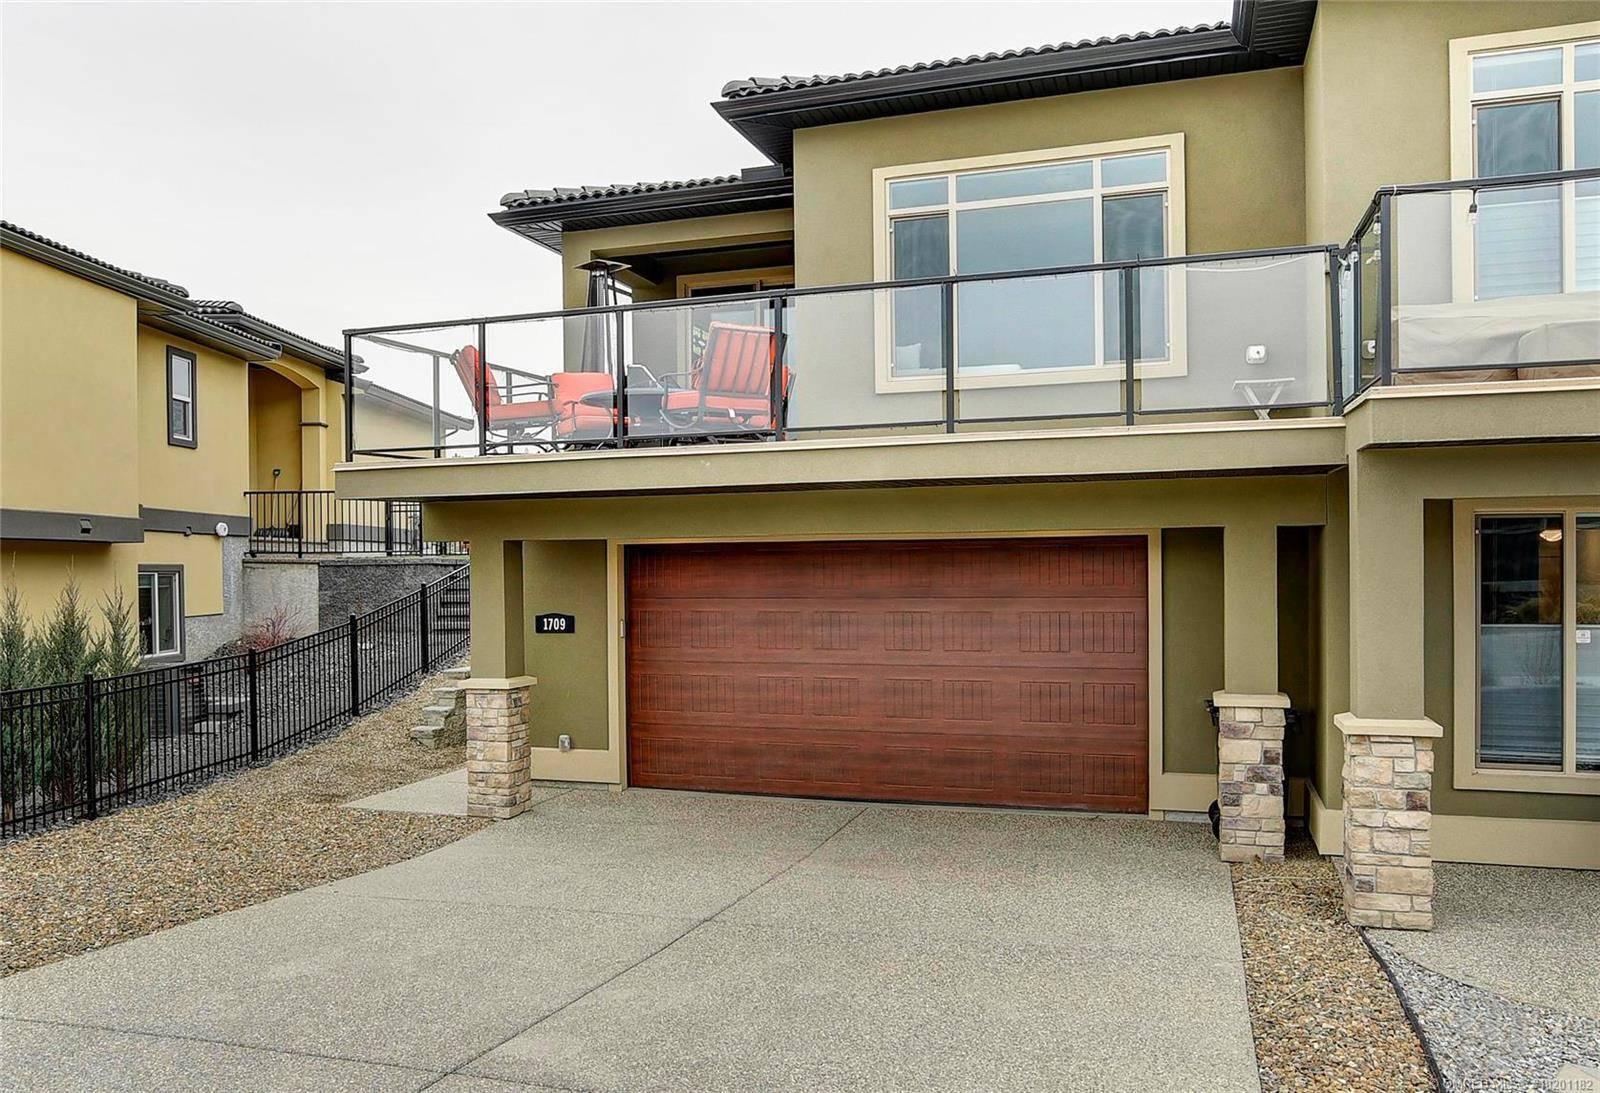 House for sale at 1709 Lake Vista Rd West Kelowna British Columbia - MLS: 10201182